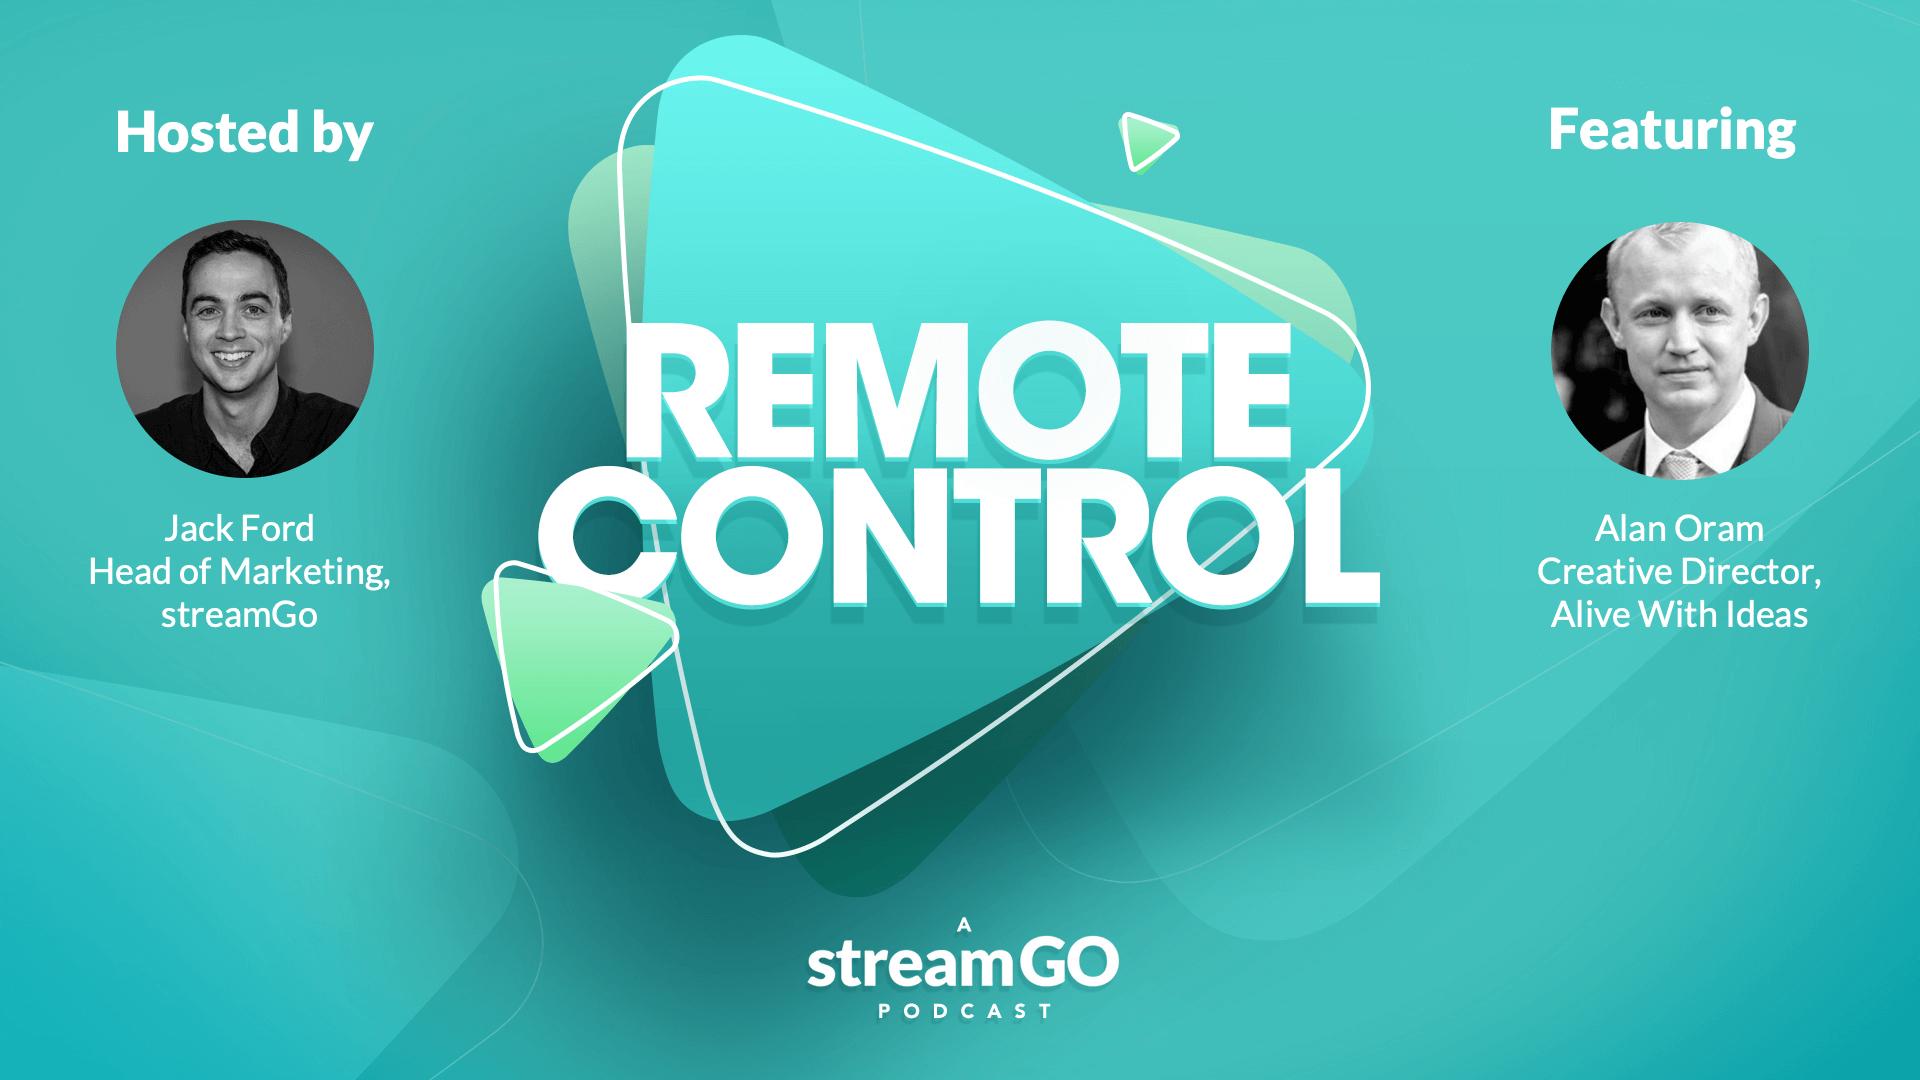 Remote Control - Alan Oram